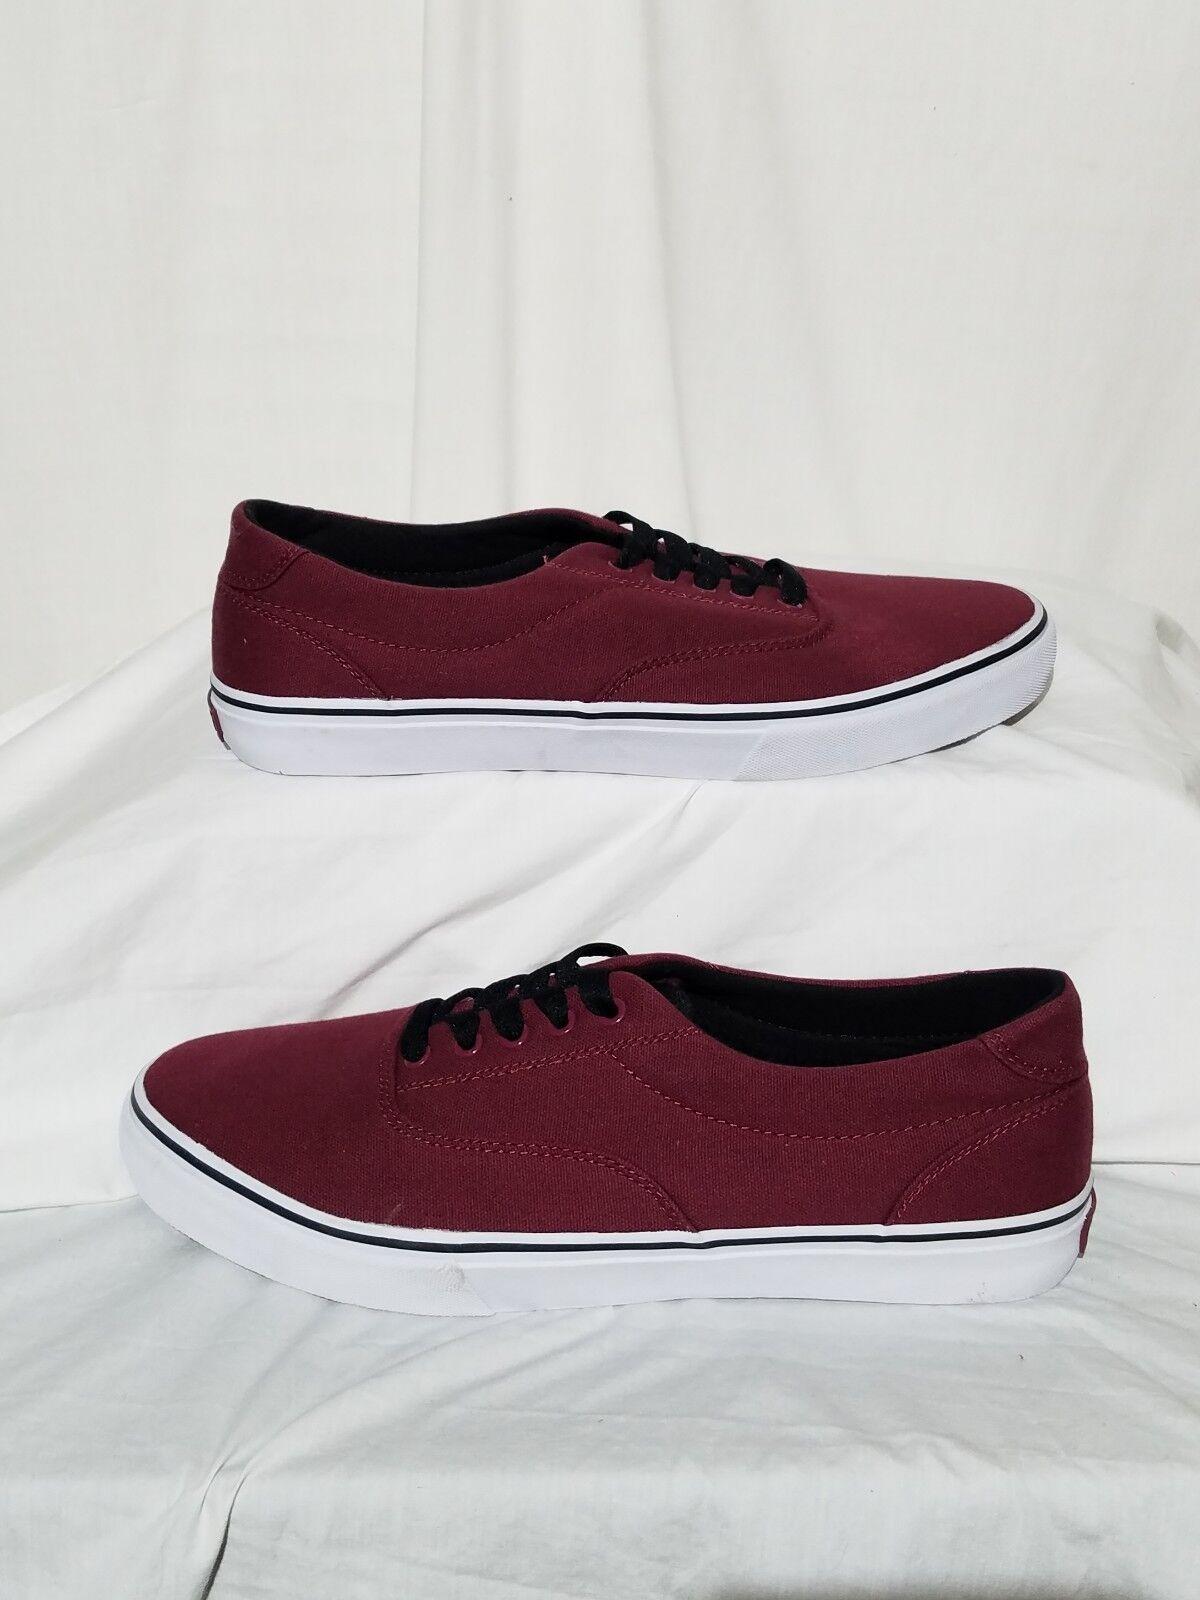 2c148a4b31e4fe NEW TONY HAWK Mens Burgundy Maroon Skateboard Athletic Shoes Size 13 13 13  d347fa